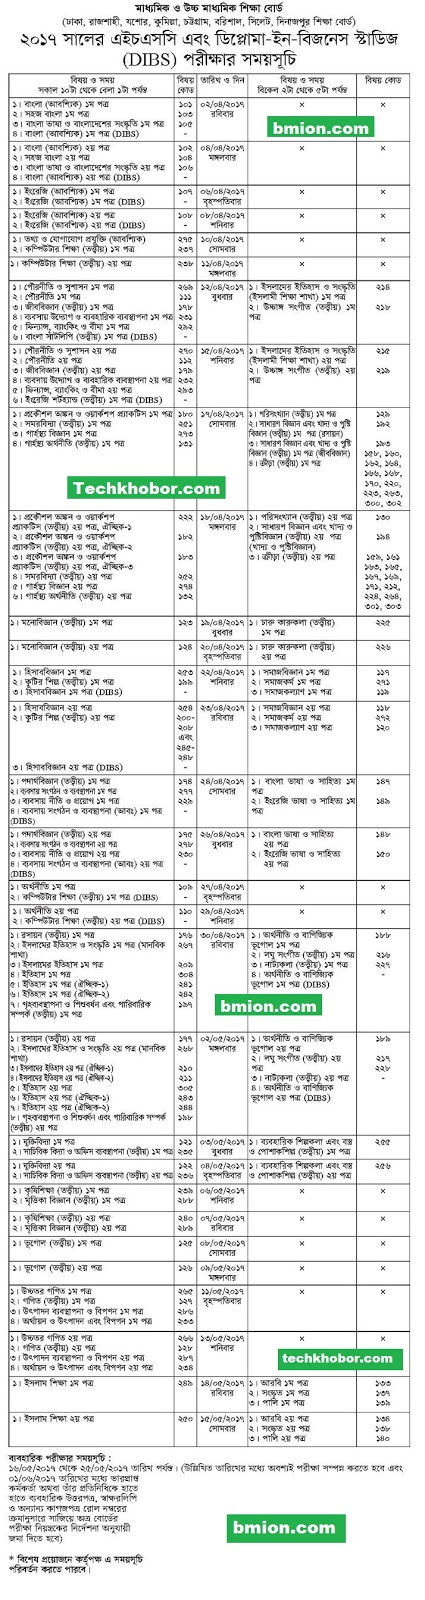 HSC-Exam-Routine-2017-DIBS-Diploma-In-Bussiness-studies-Dhaka-Comilla-Rajshahi-Jessore-Chittagong-barishal-Sylhet-Dinajpur-Board-bangladesh-bd